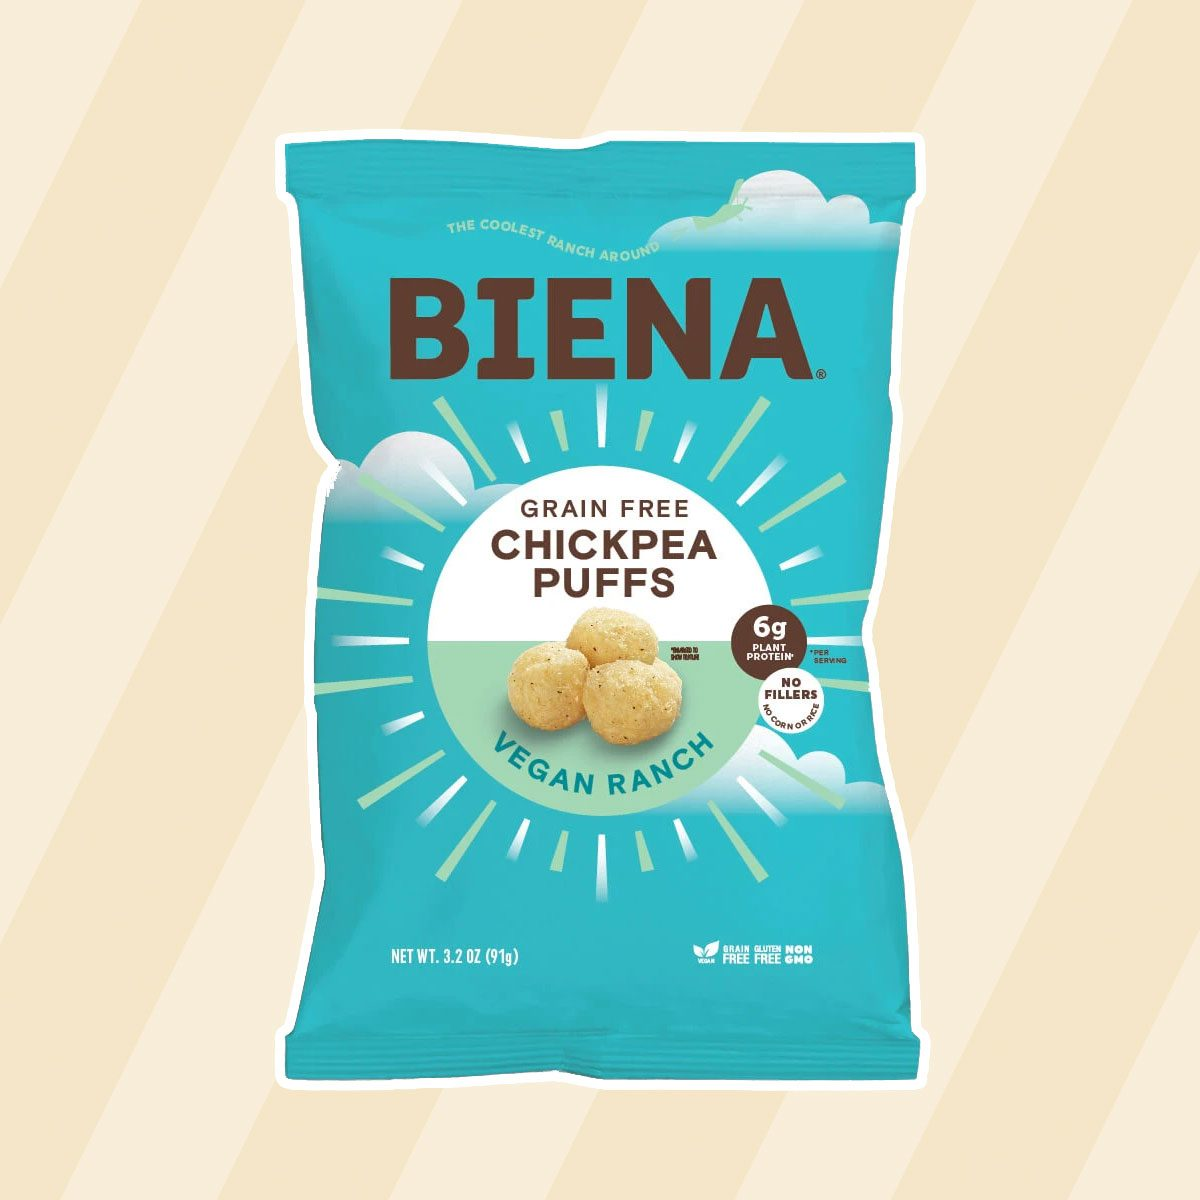 healthy snacks to buy Biena Vegan Chickpea Puffs